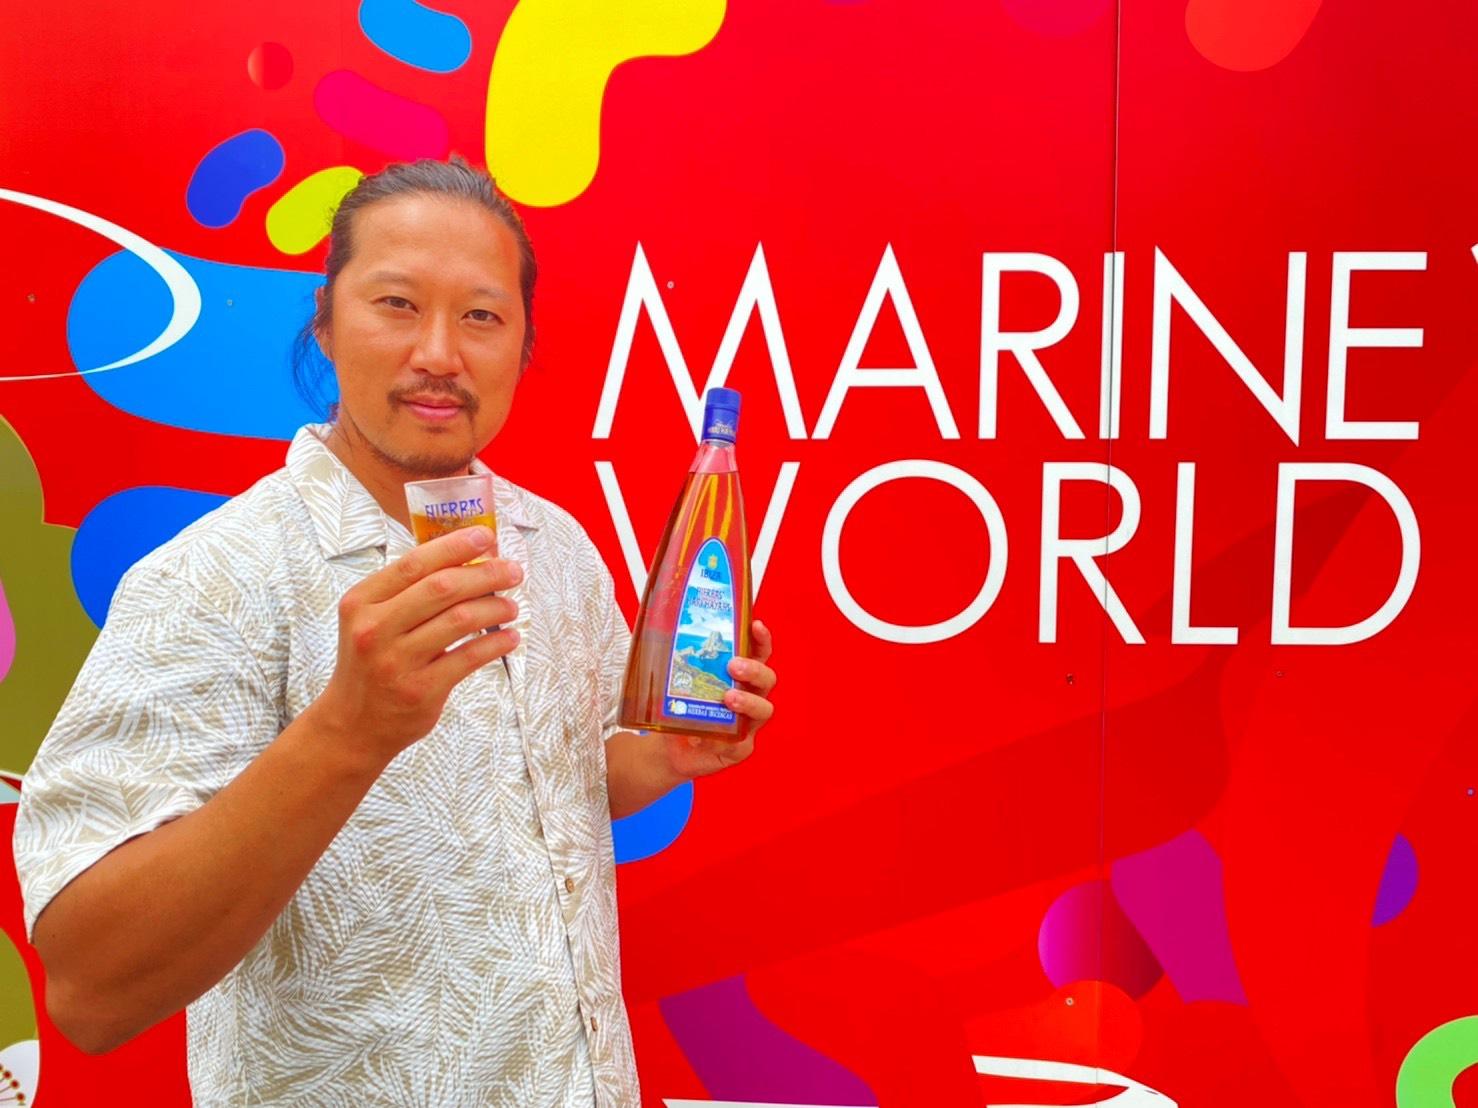 MARINE WORLD 小樽 ドリームビーチ